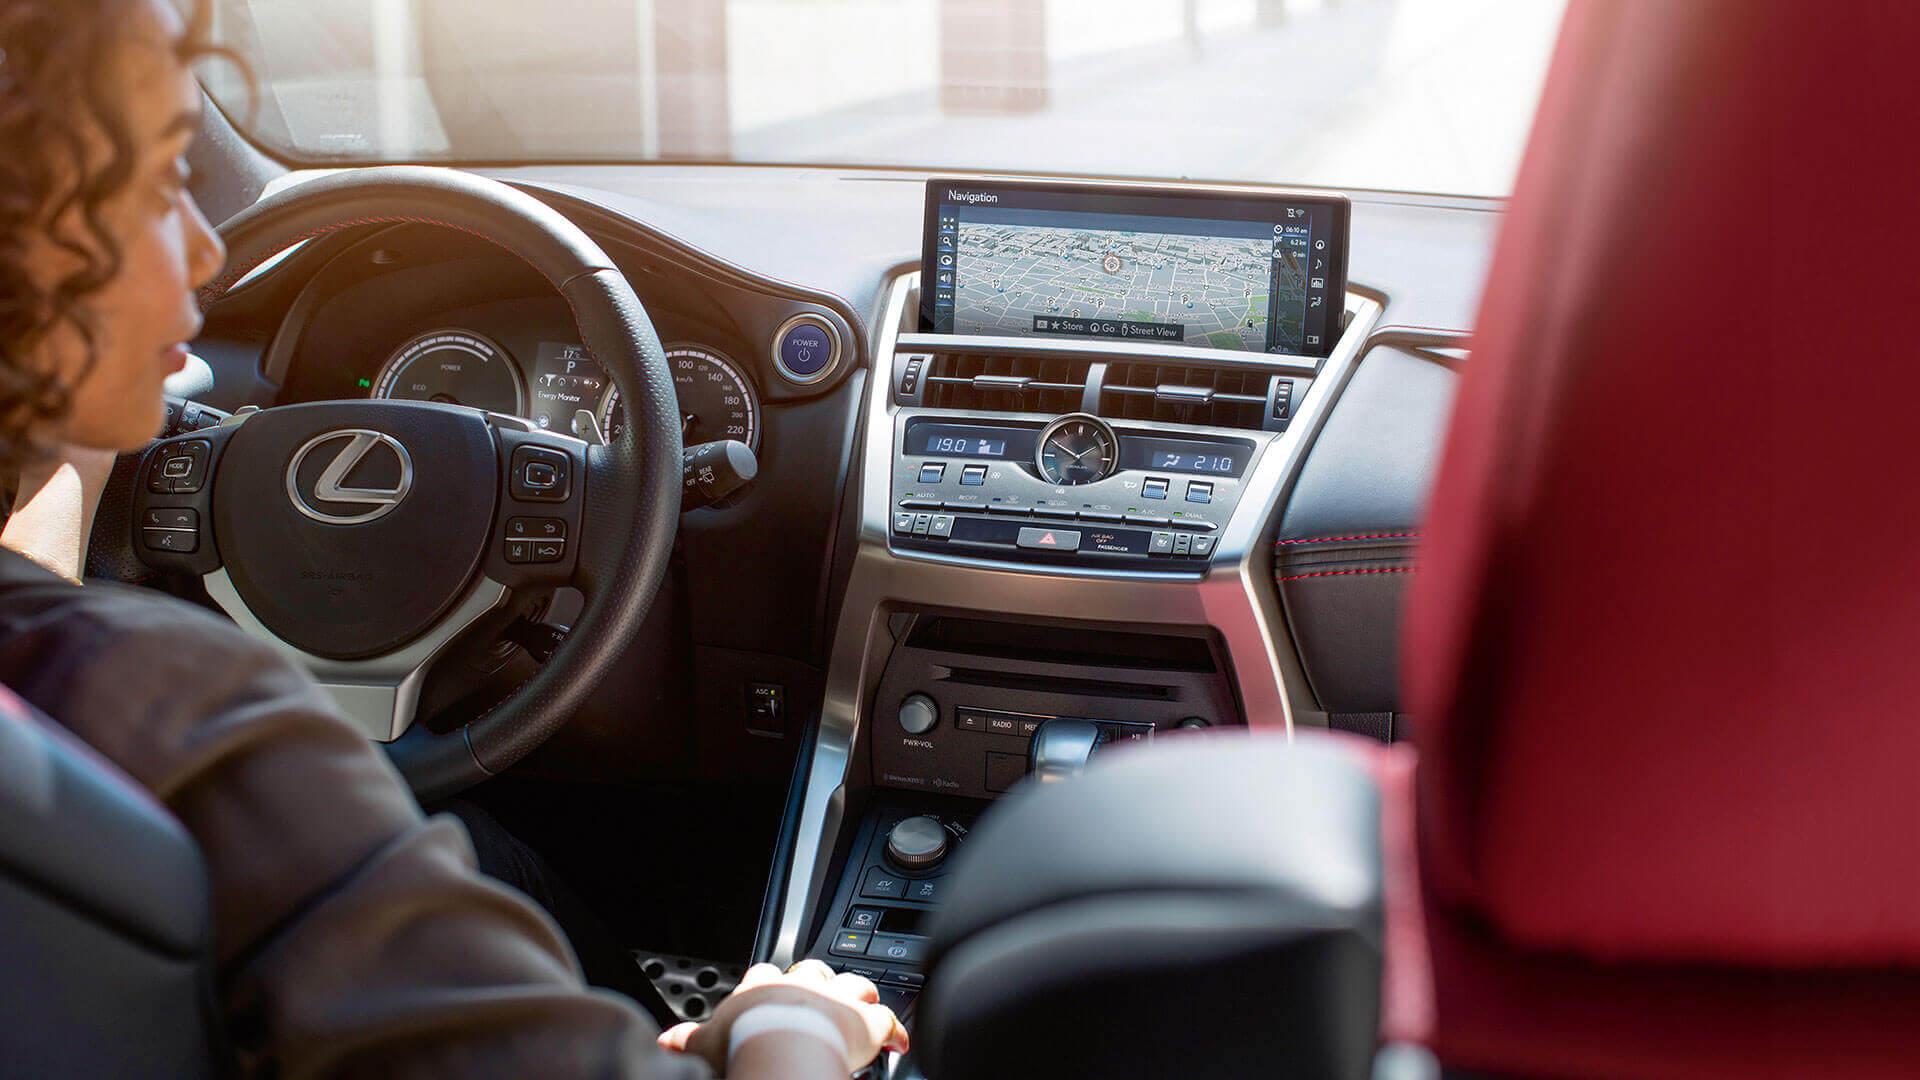 NX 300h Business Full Drive | Promociones | Lexus España